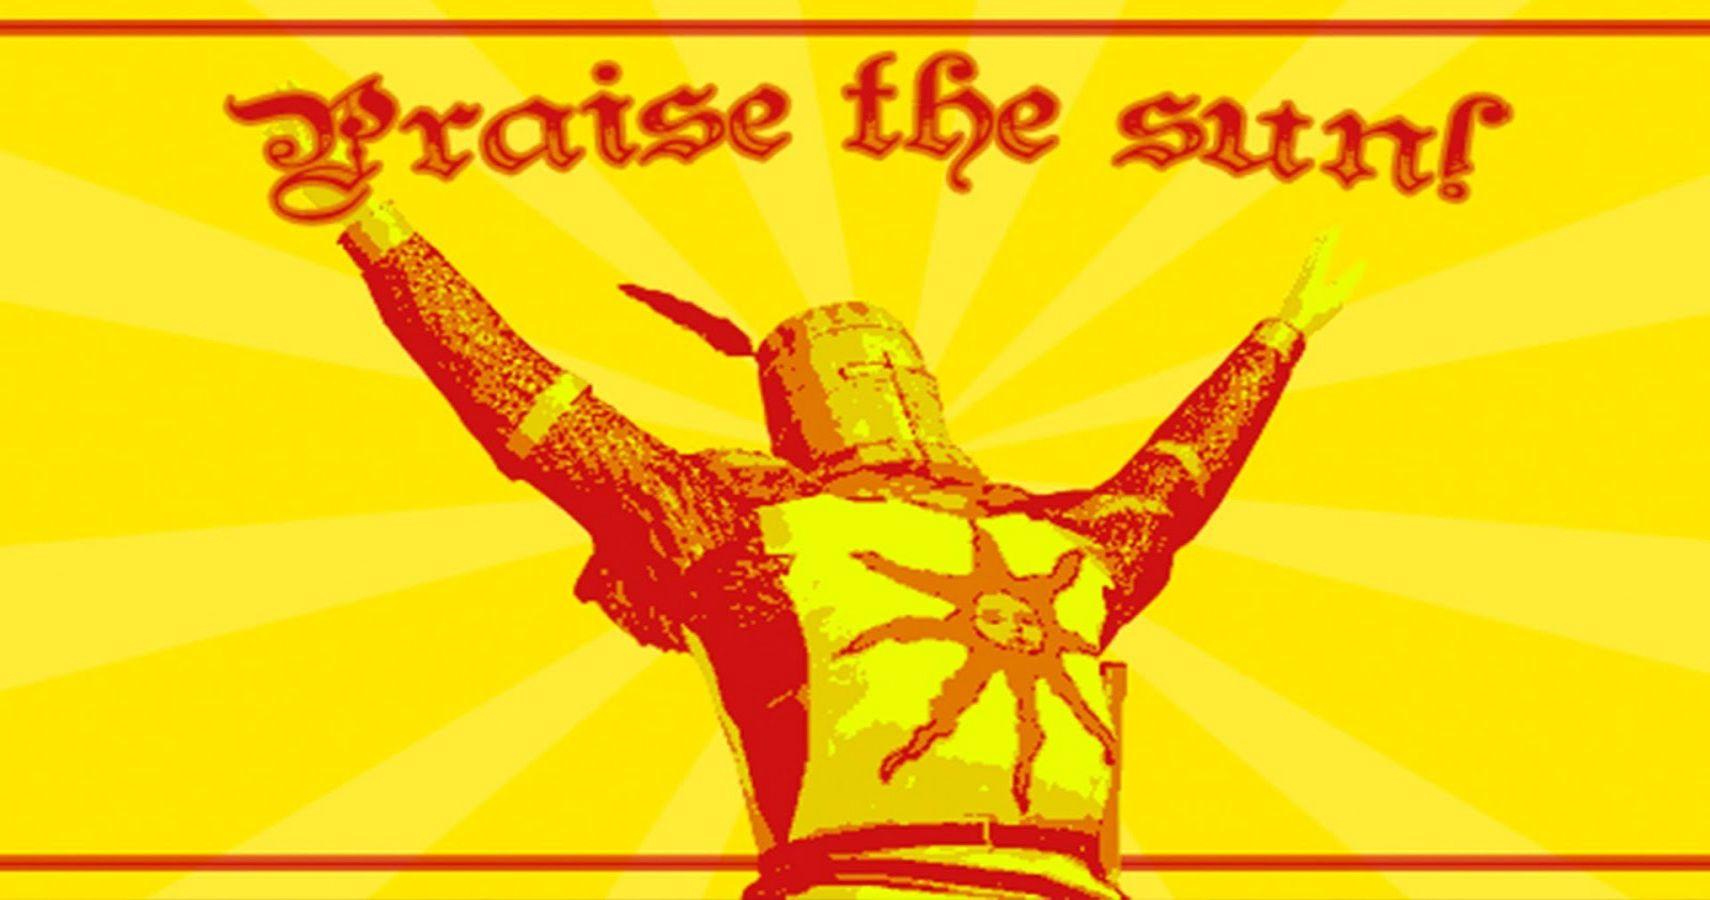 Dark Souls: The 10 Best Praise The Sun Memes | ScreenRant